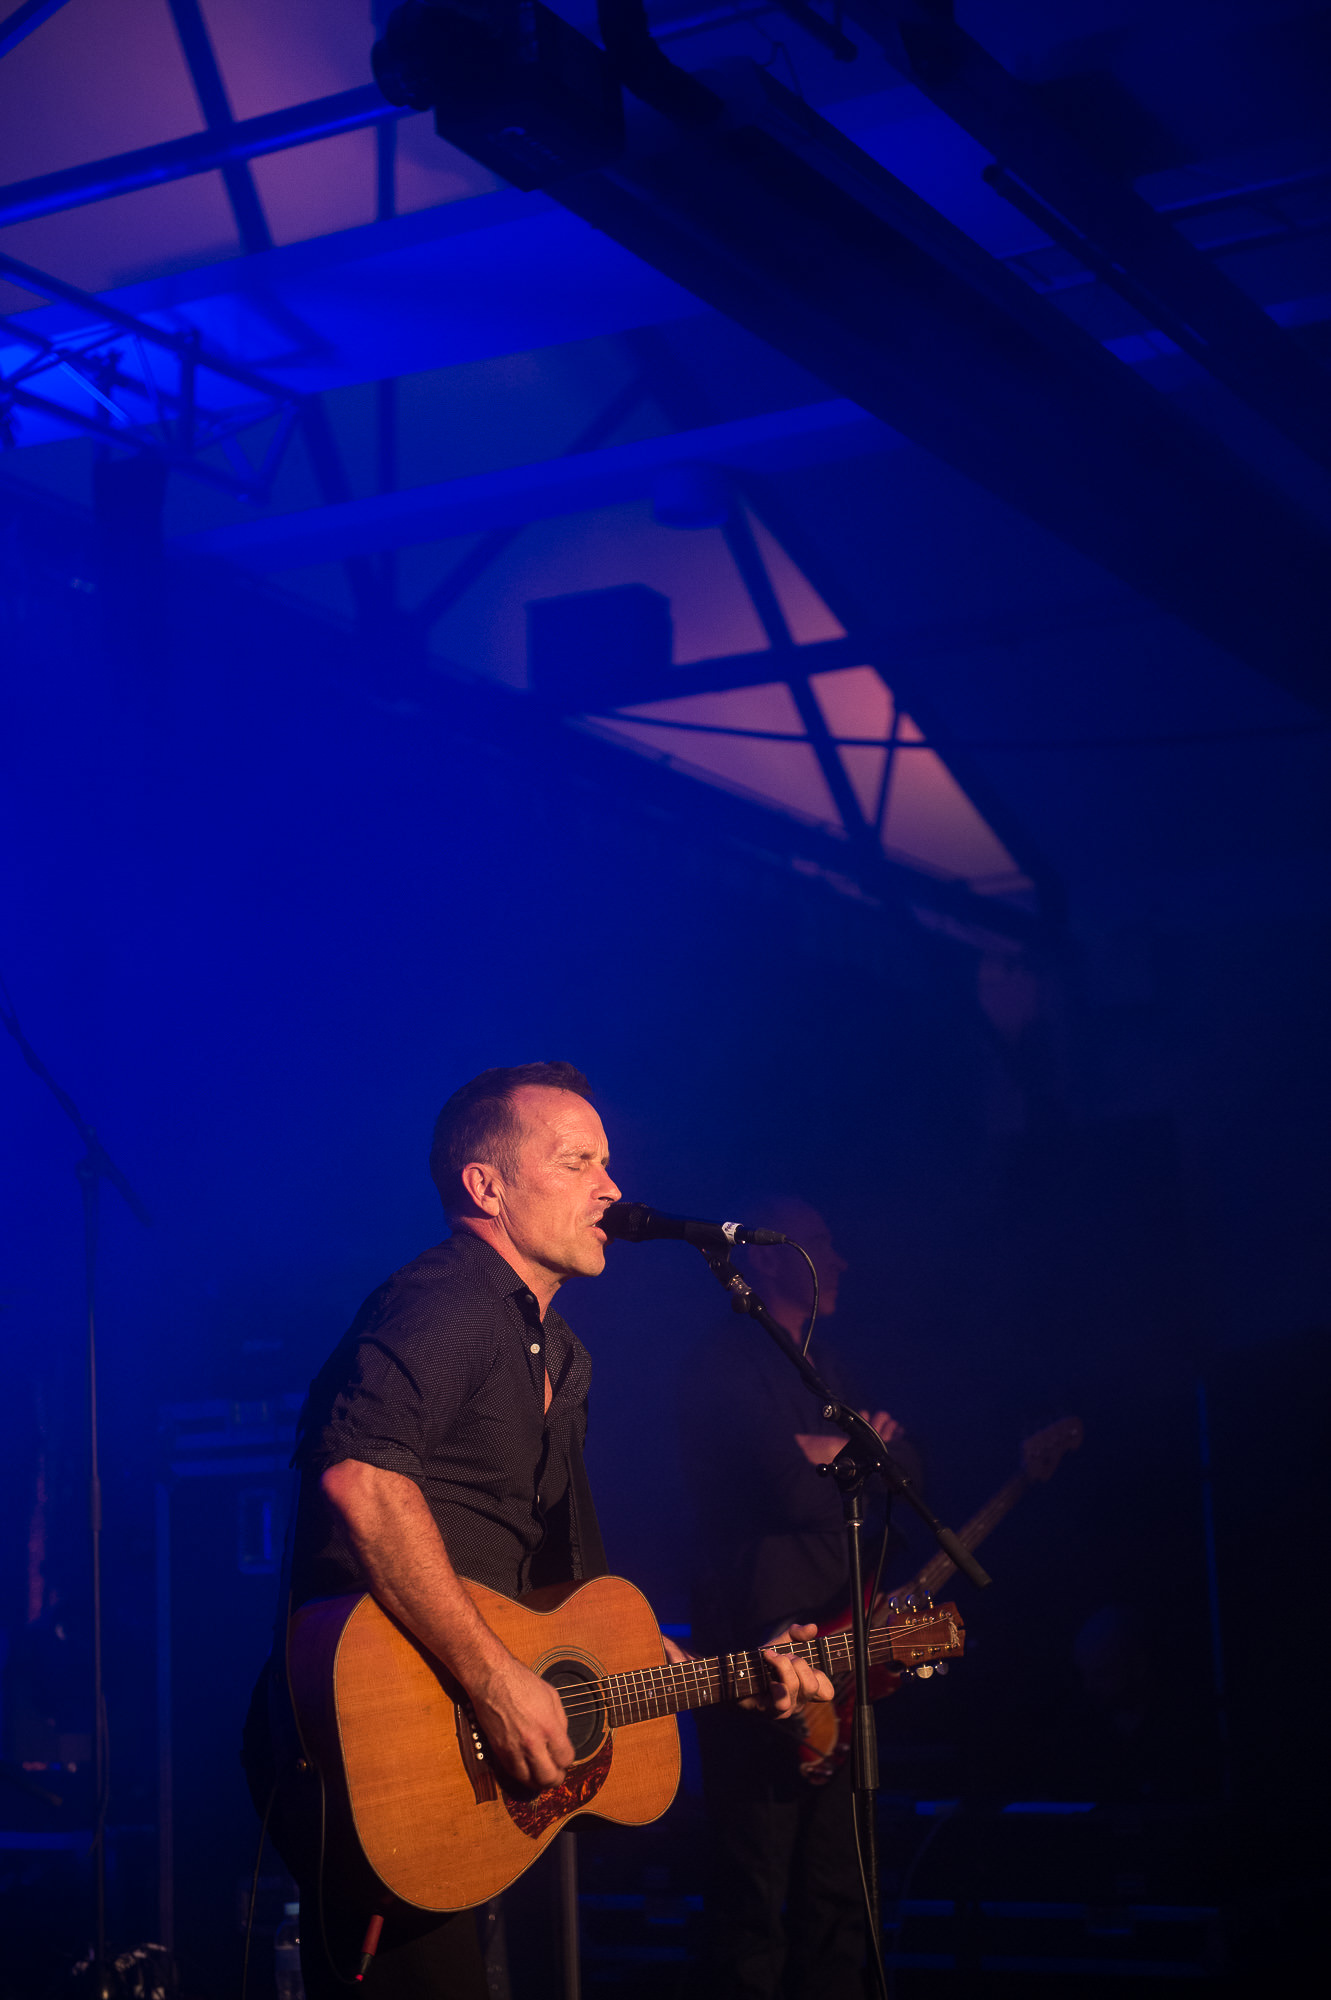 Tasmanian_Event_Photographer_18.jpg